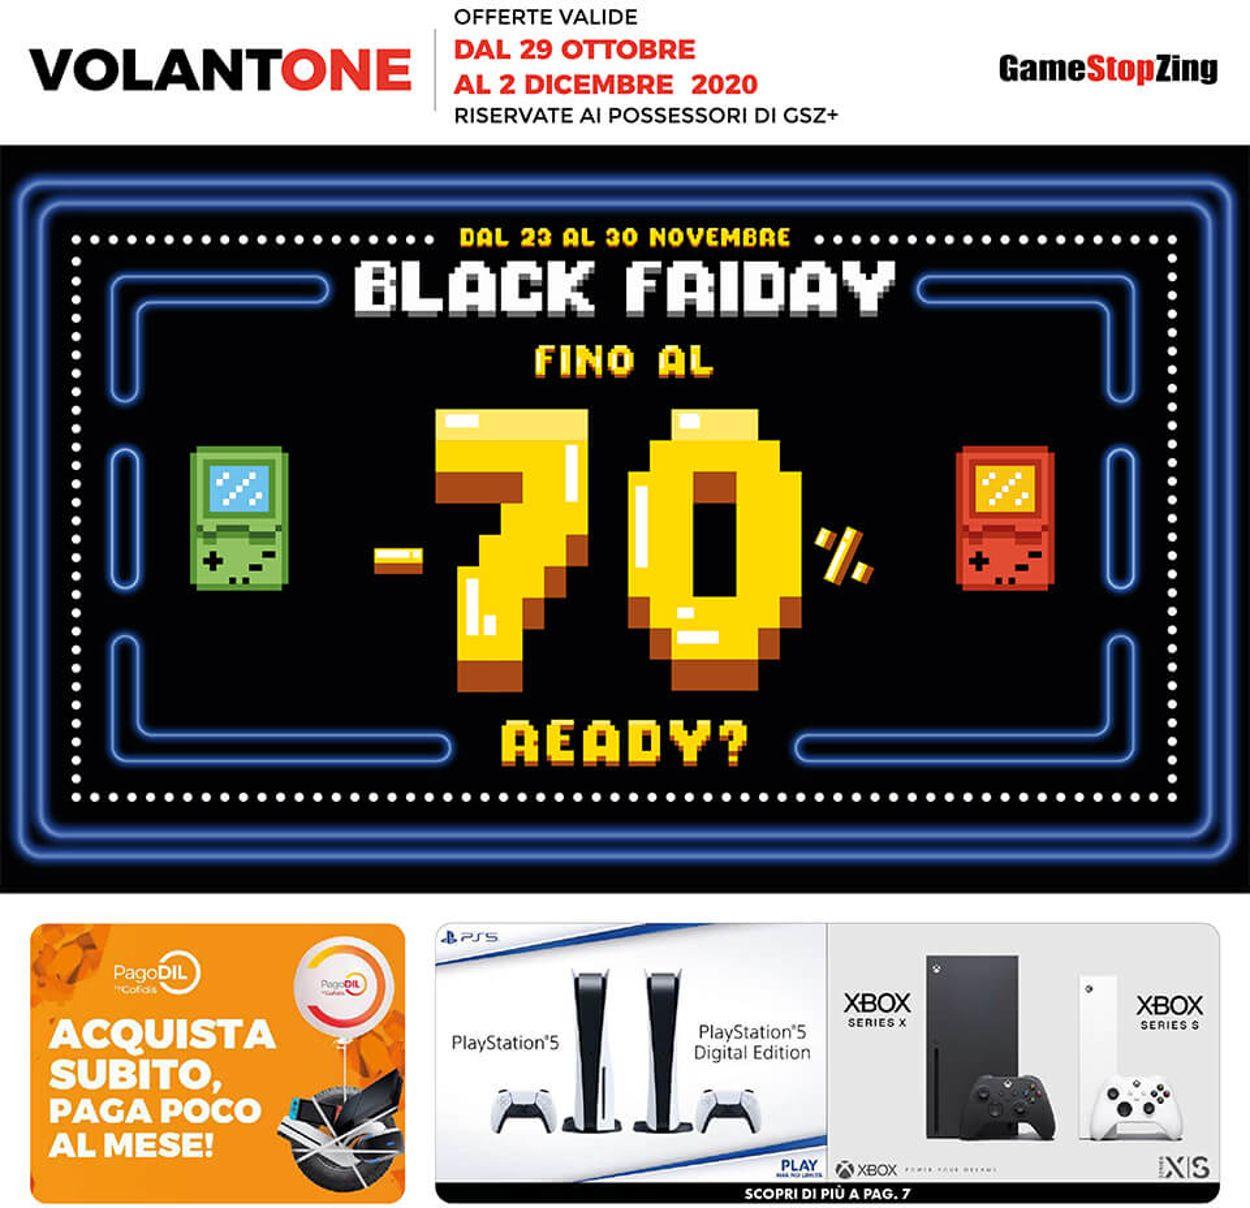 Volantino Gamestop - Black Friday 2020 - Offerte 29/10-02/12/2020